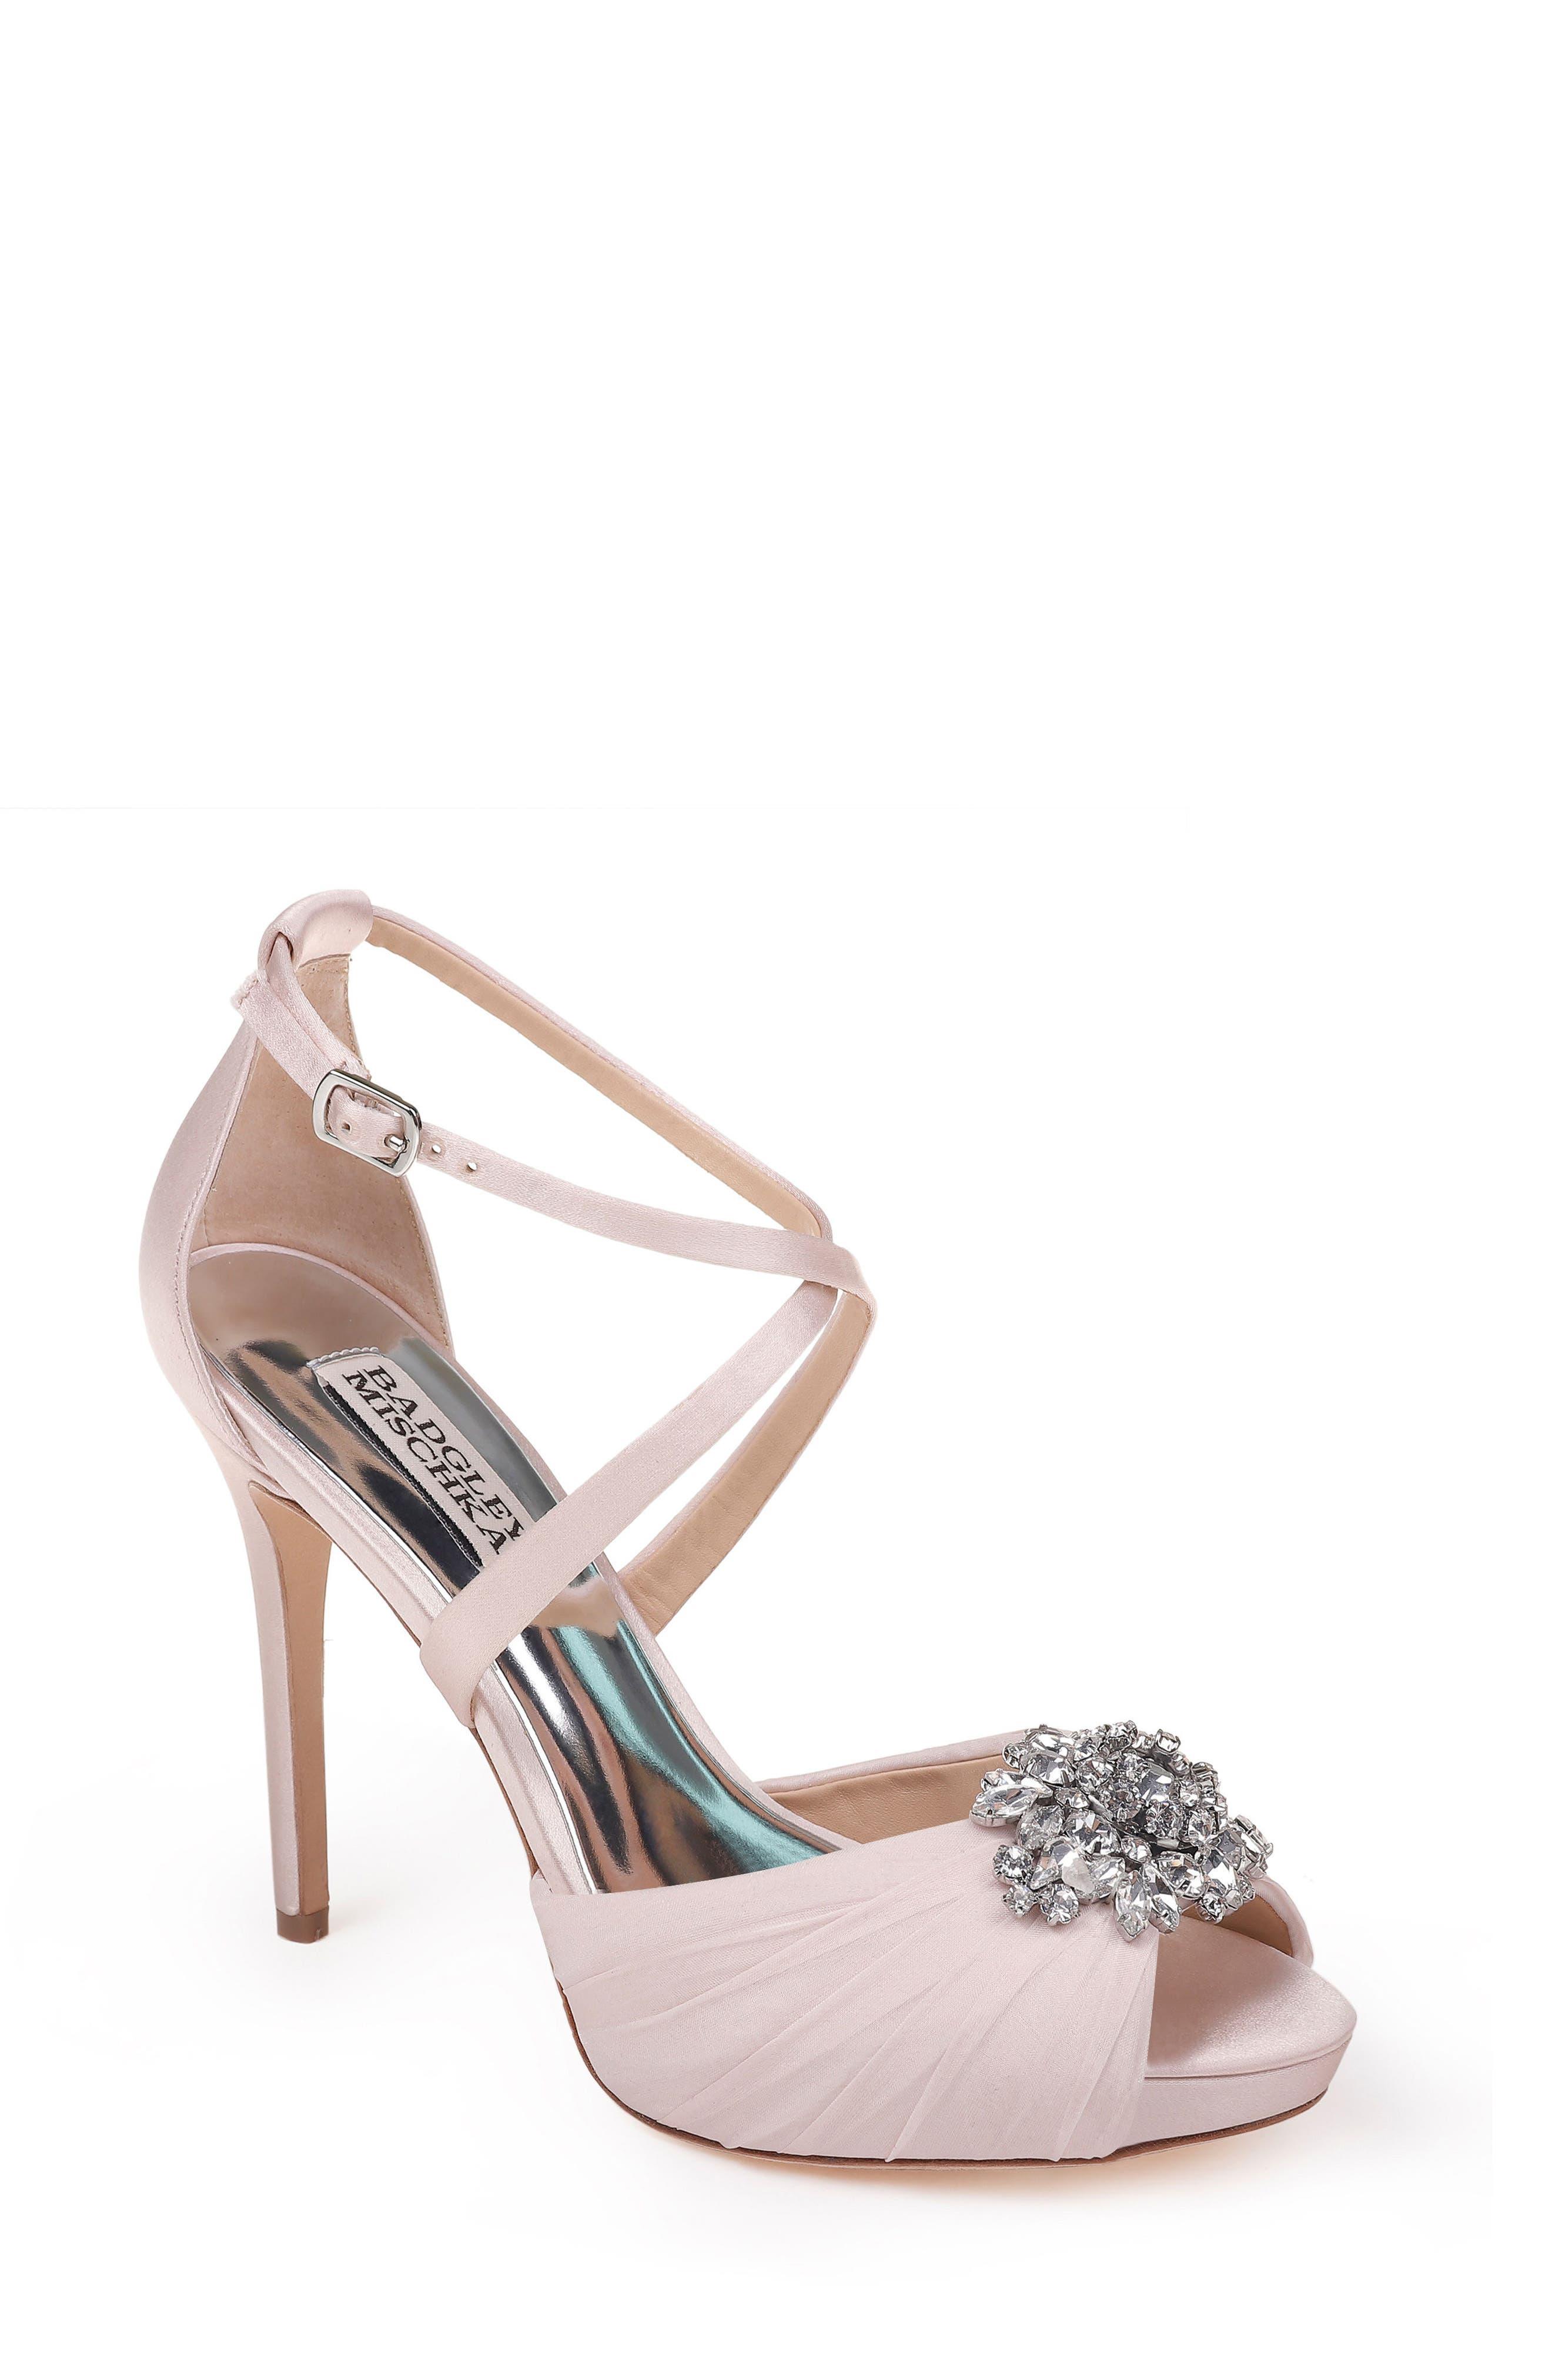 Alternate Image 1 Selected - Badgley Mischka Sadie Strappy Sandal (Women)